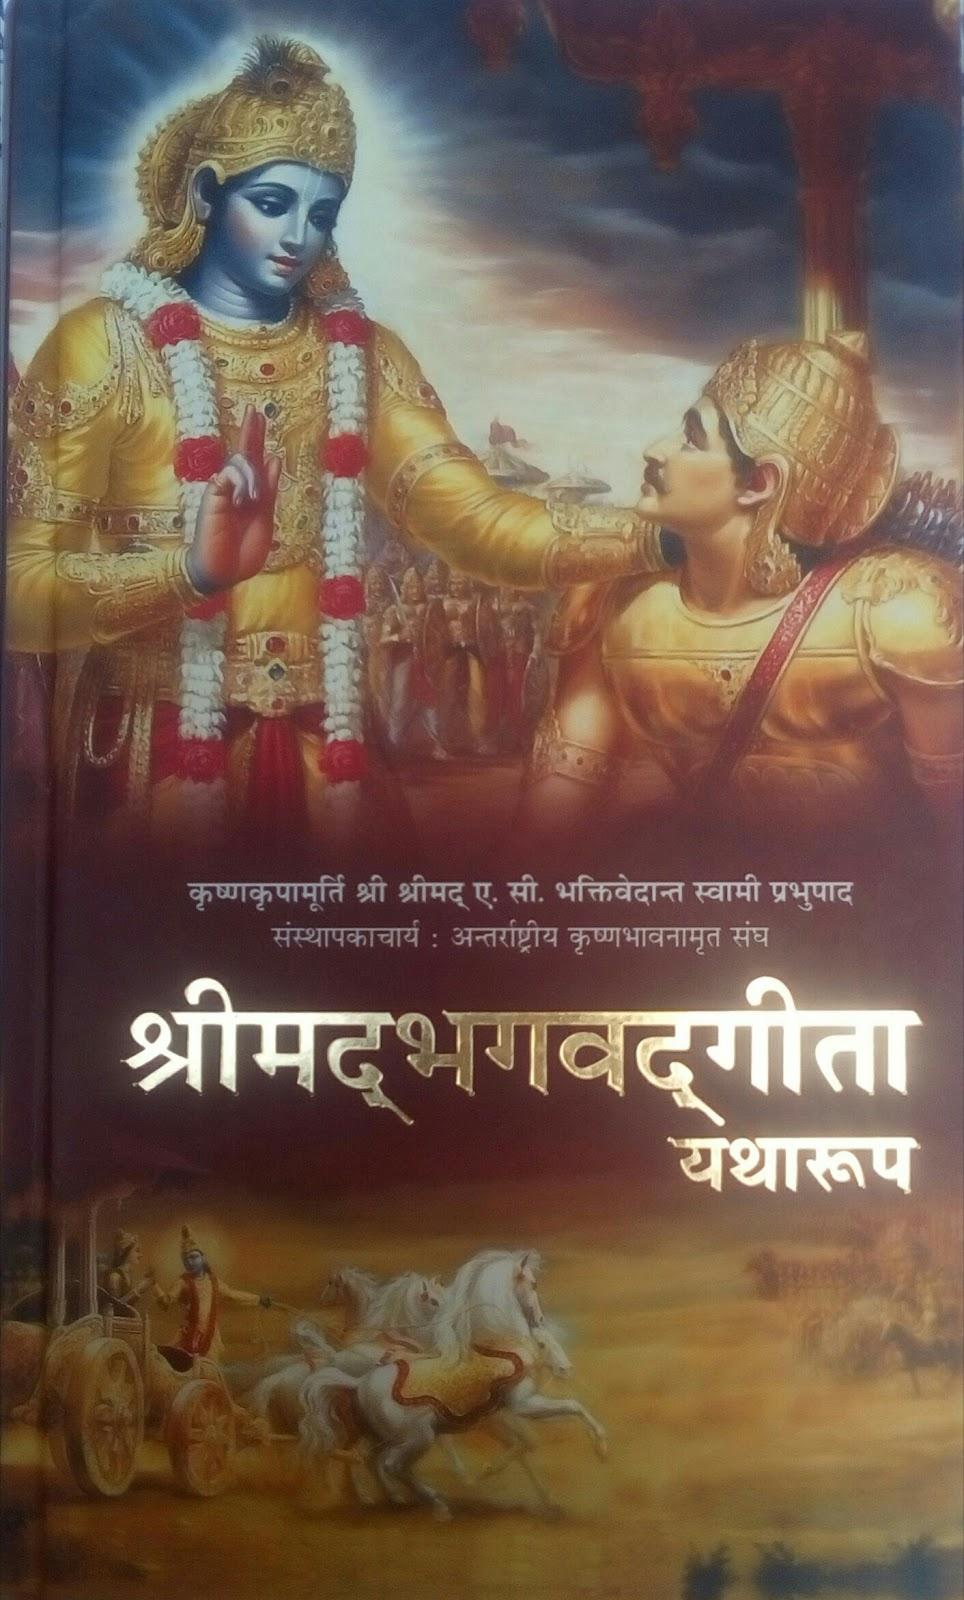 bhagwatgita - PaisaRani-com